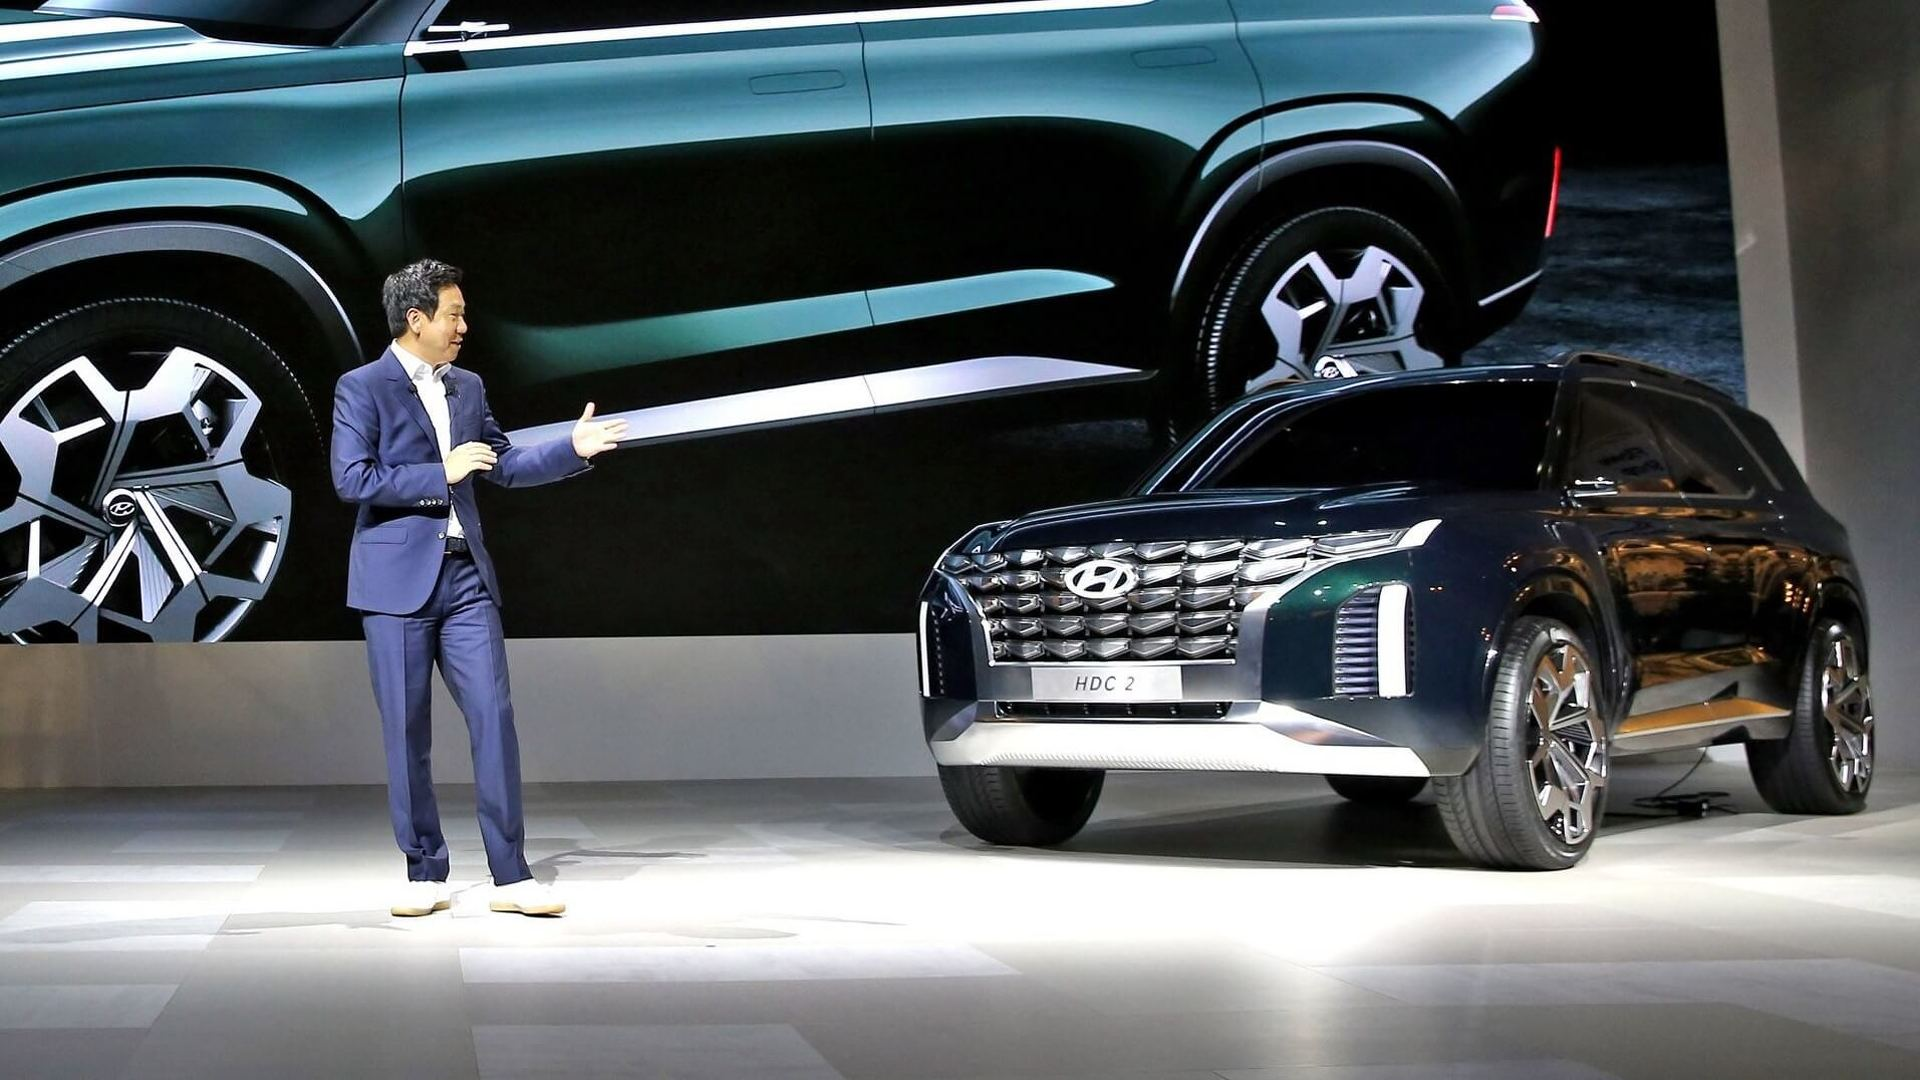 hyundai-hdc-2-grandmaster-concept-7 SUV-ul Hyundai se zvoneste a fi un concurent pentru Toyota Land Cruiser